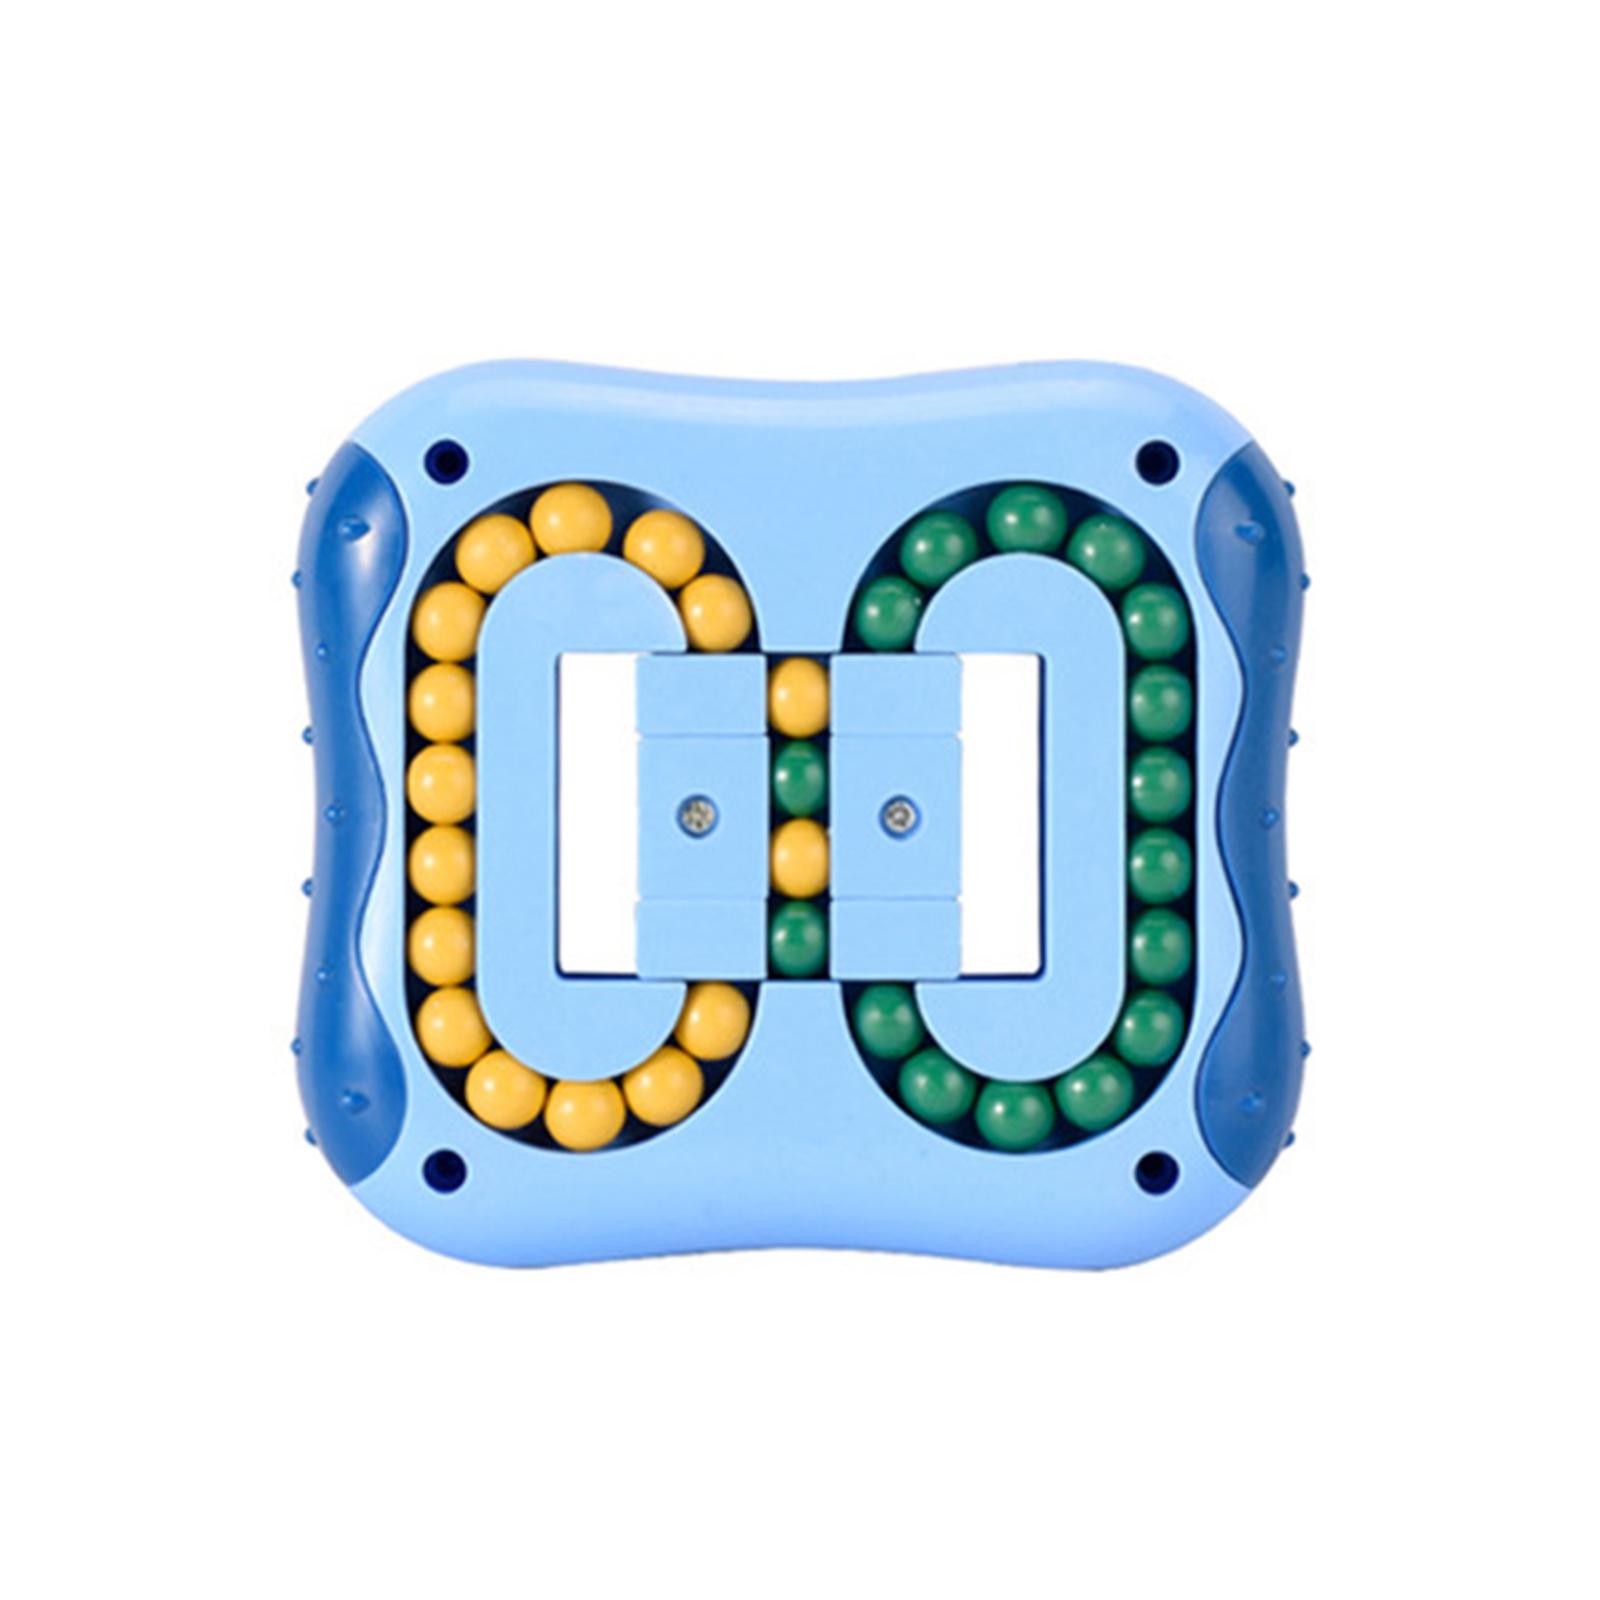 Bzfuture Rotating Magic Bean Intelligence Fingertip Cube